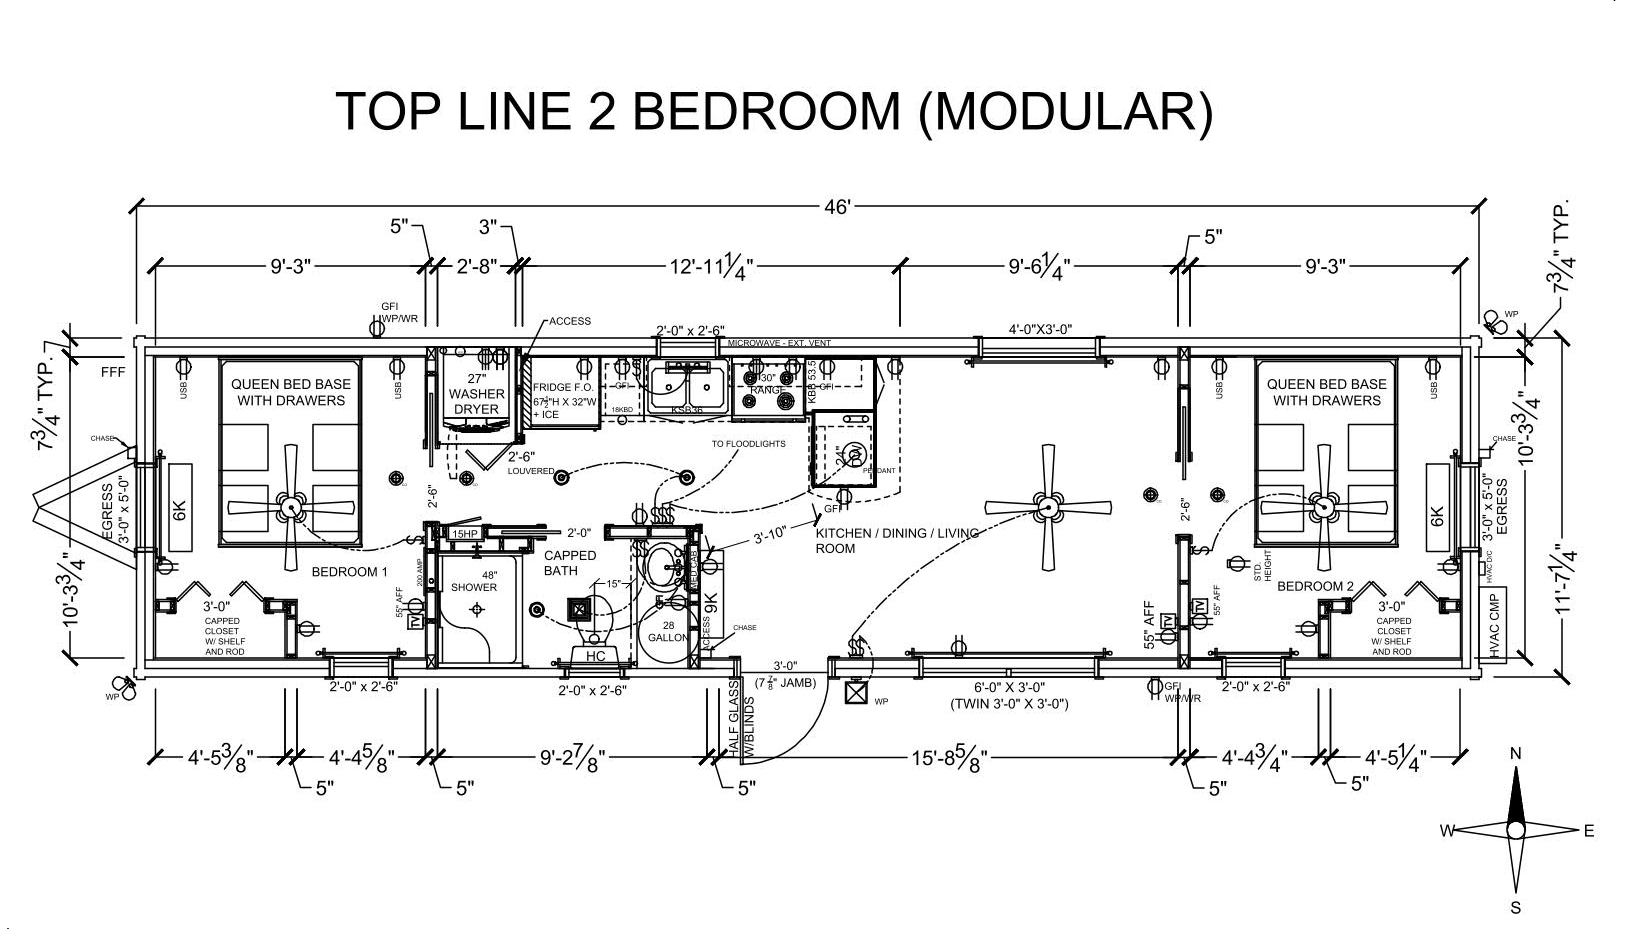 TOP-LINE 2BDR MODULAR CABIN